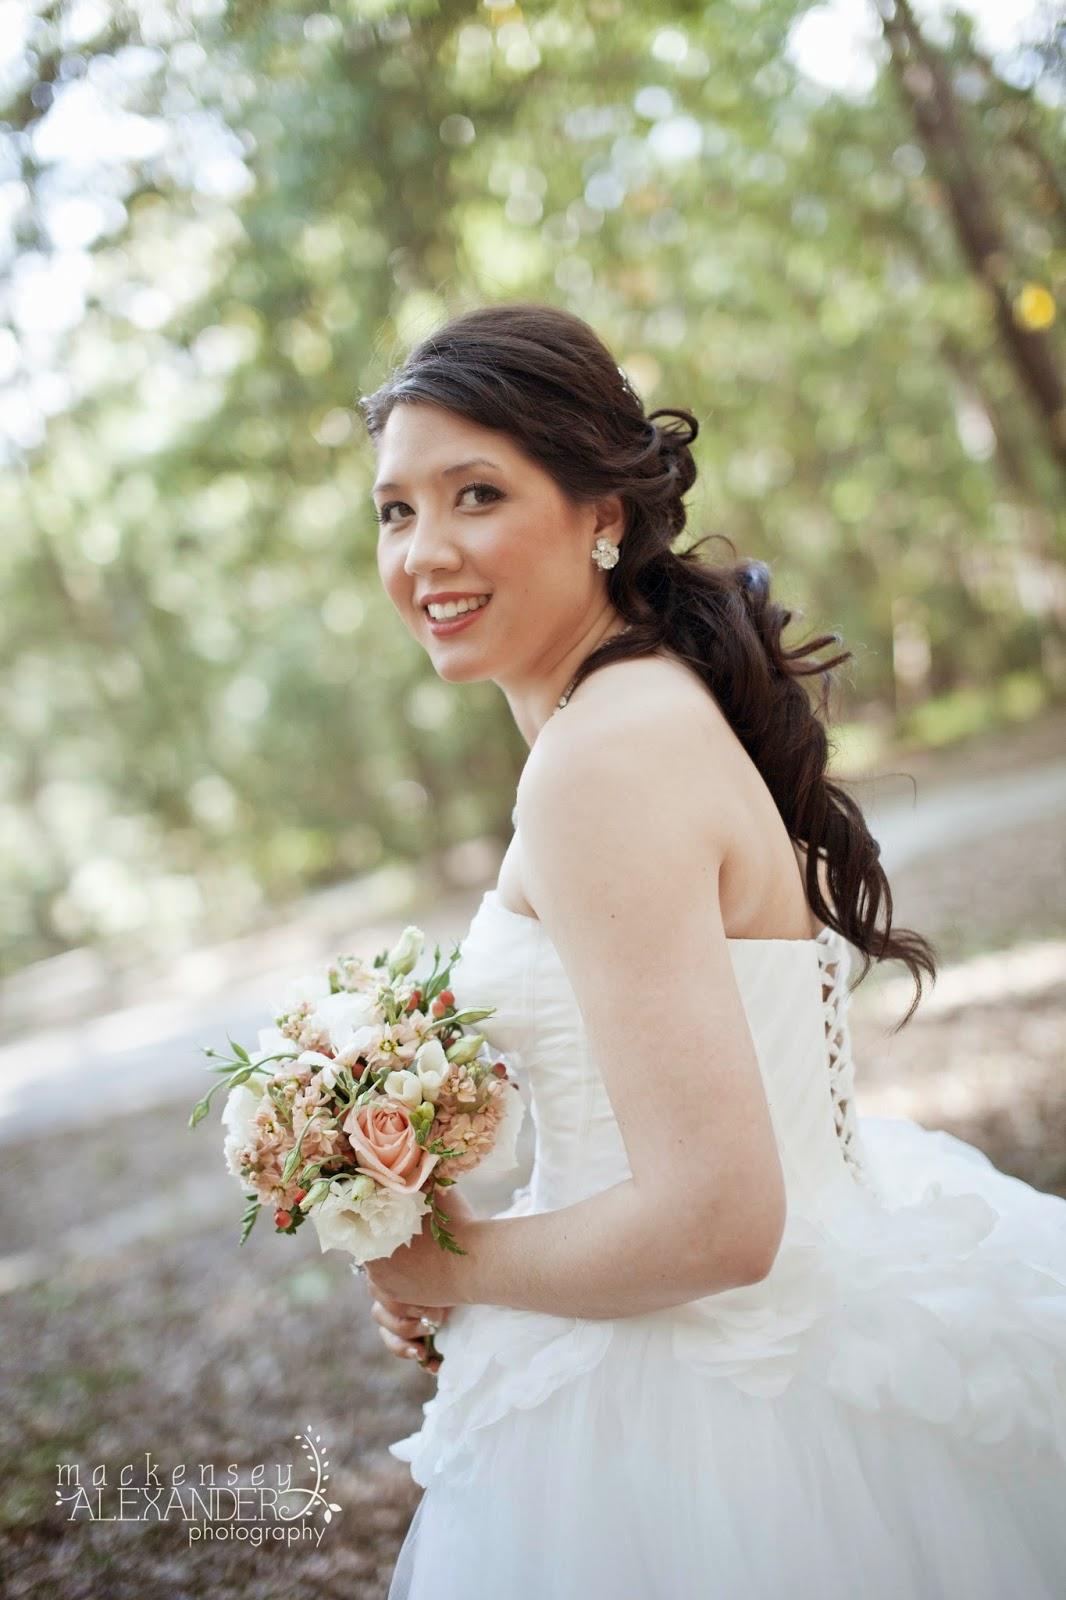 makeup artist savannah, ga: bridal make up & hair